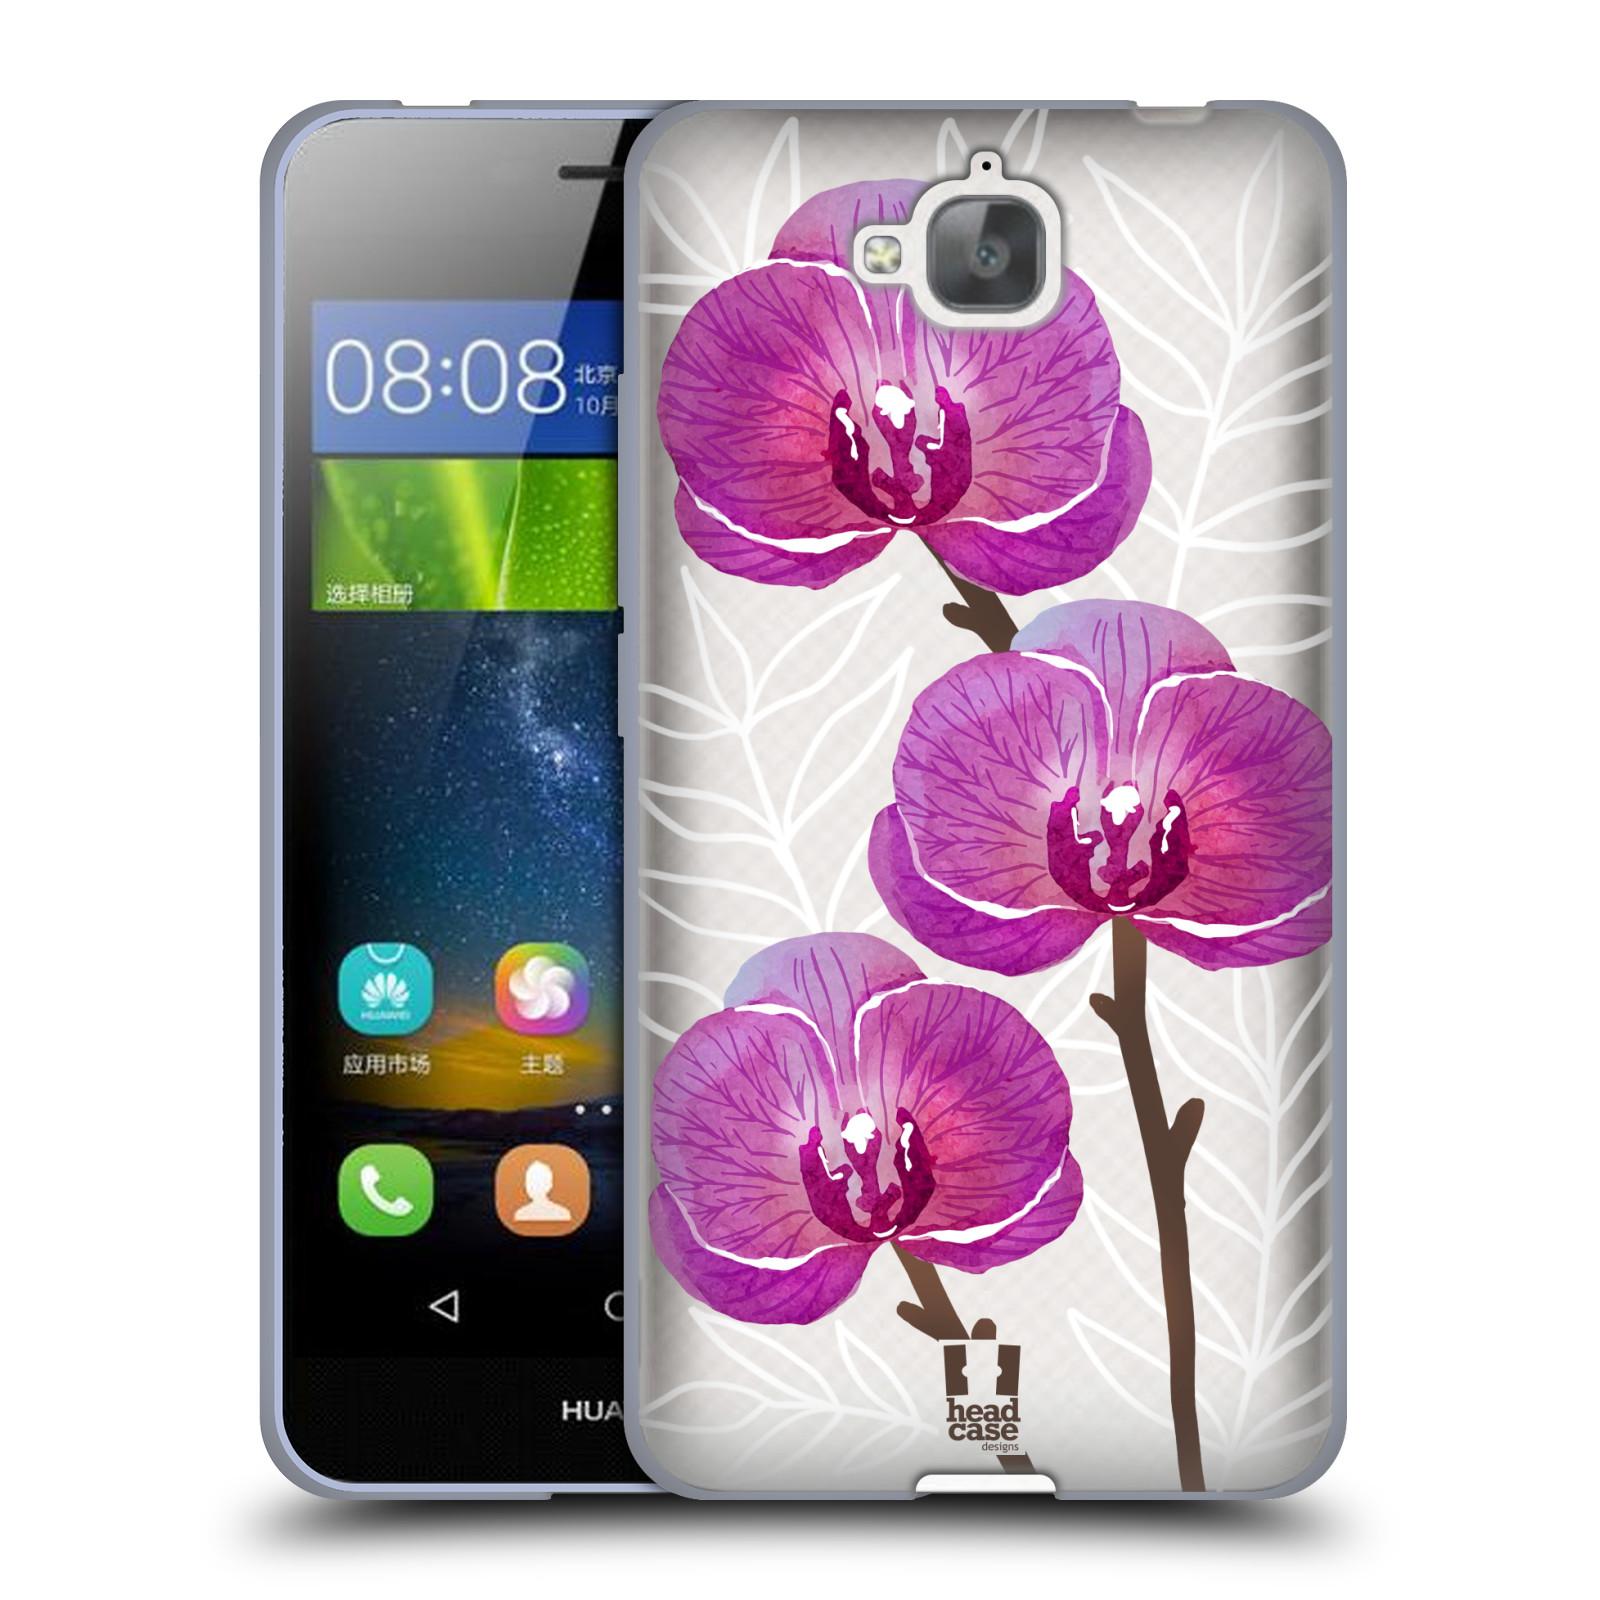 Silikonové pouzdro na mobil Huawei Y6 Pro Dual Sim - Head Case - Hezoučké kvítky - průhledné